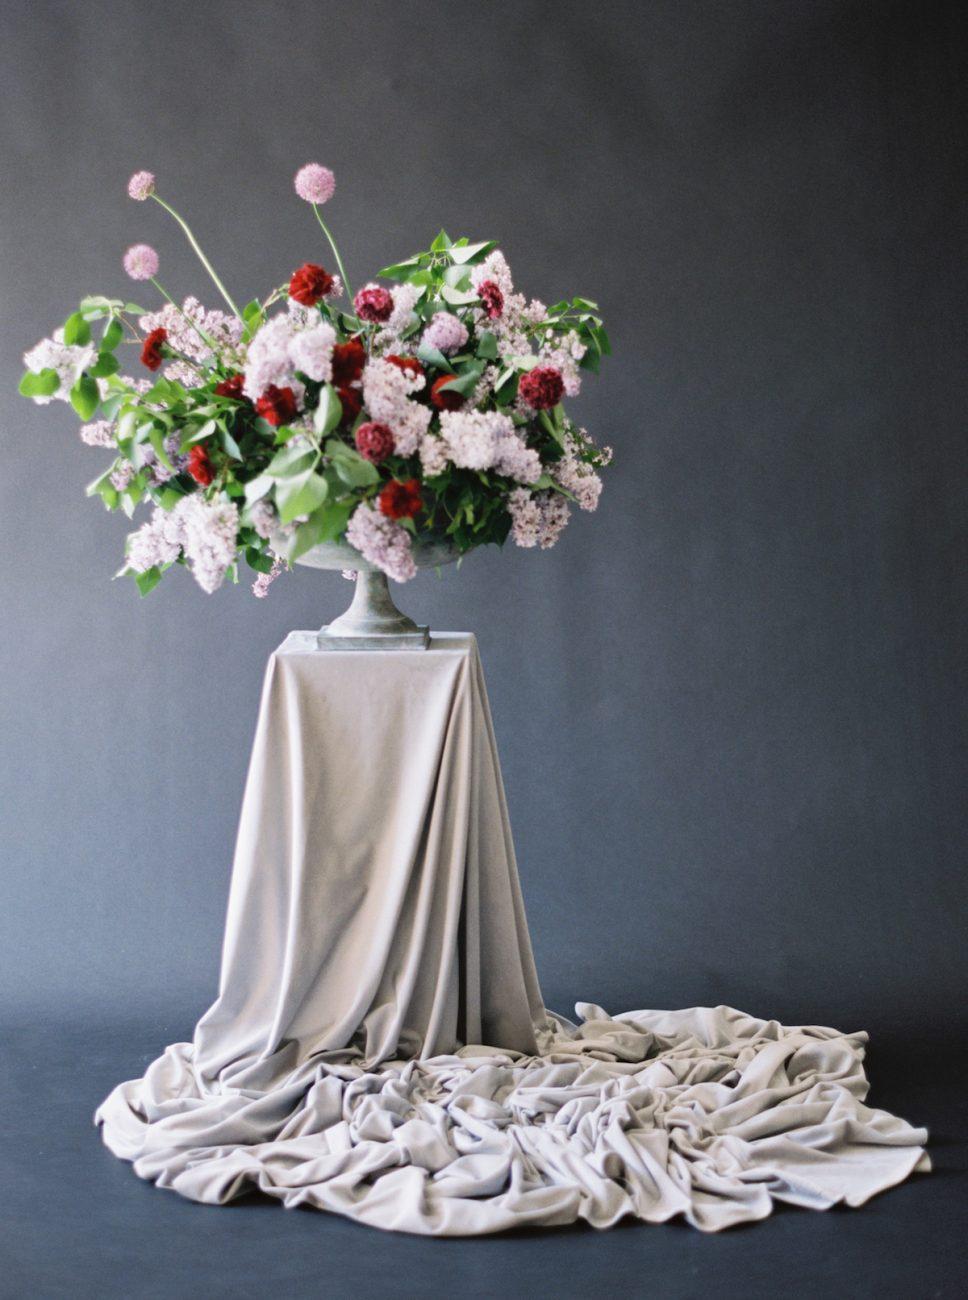 Moody Black Wedding Inspiration_pink and red large floral arrangement